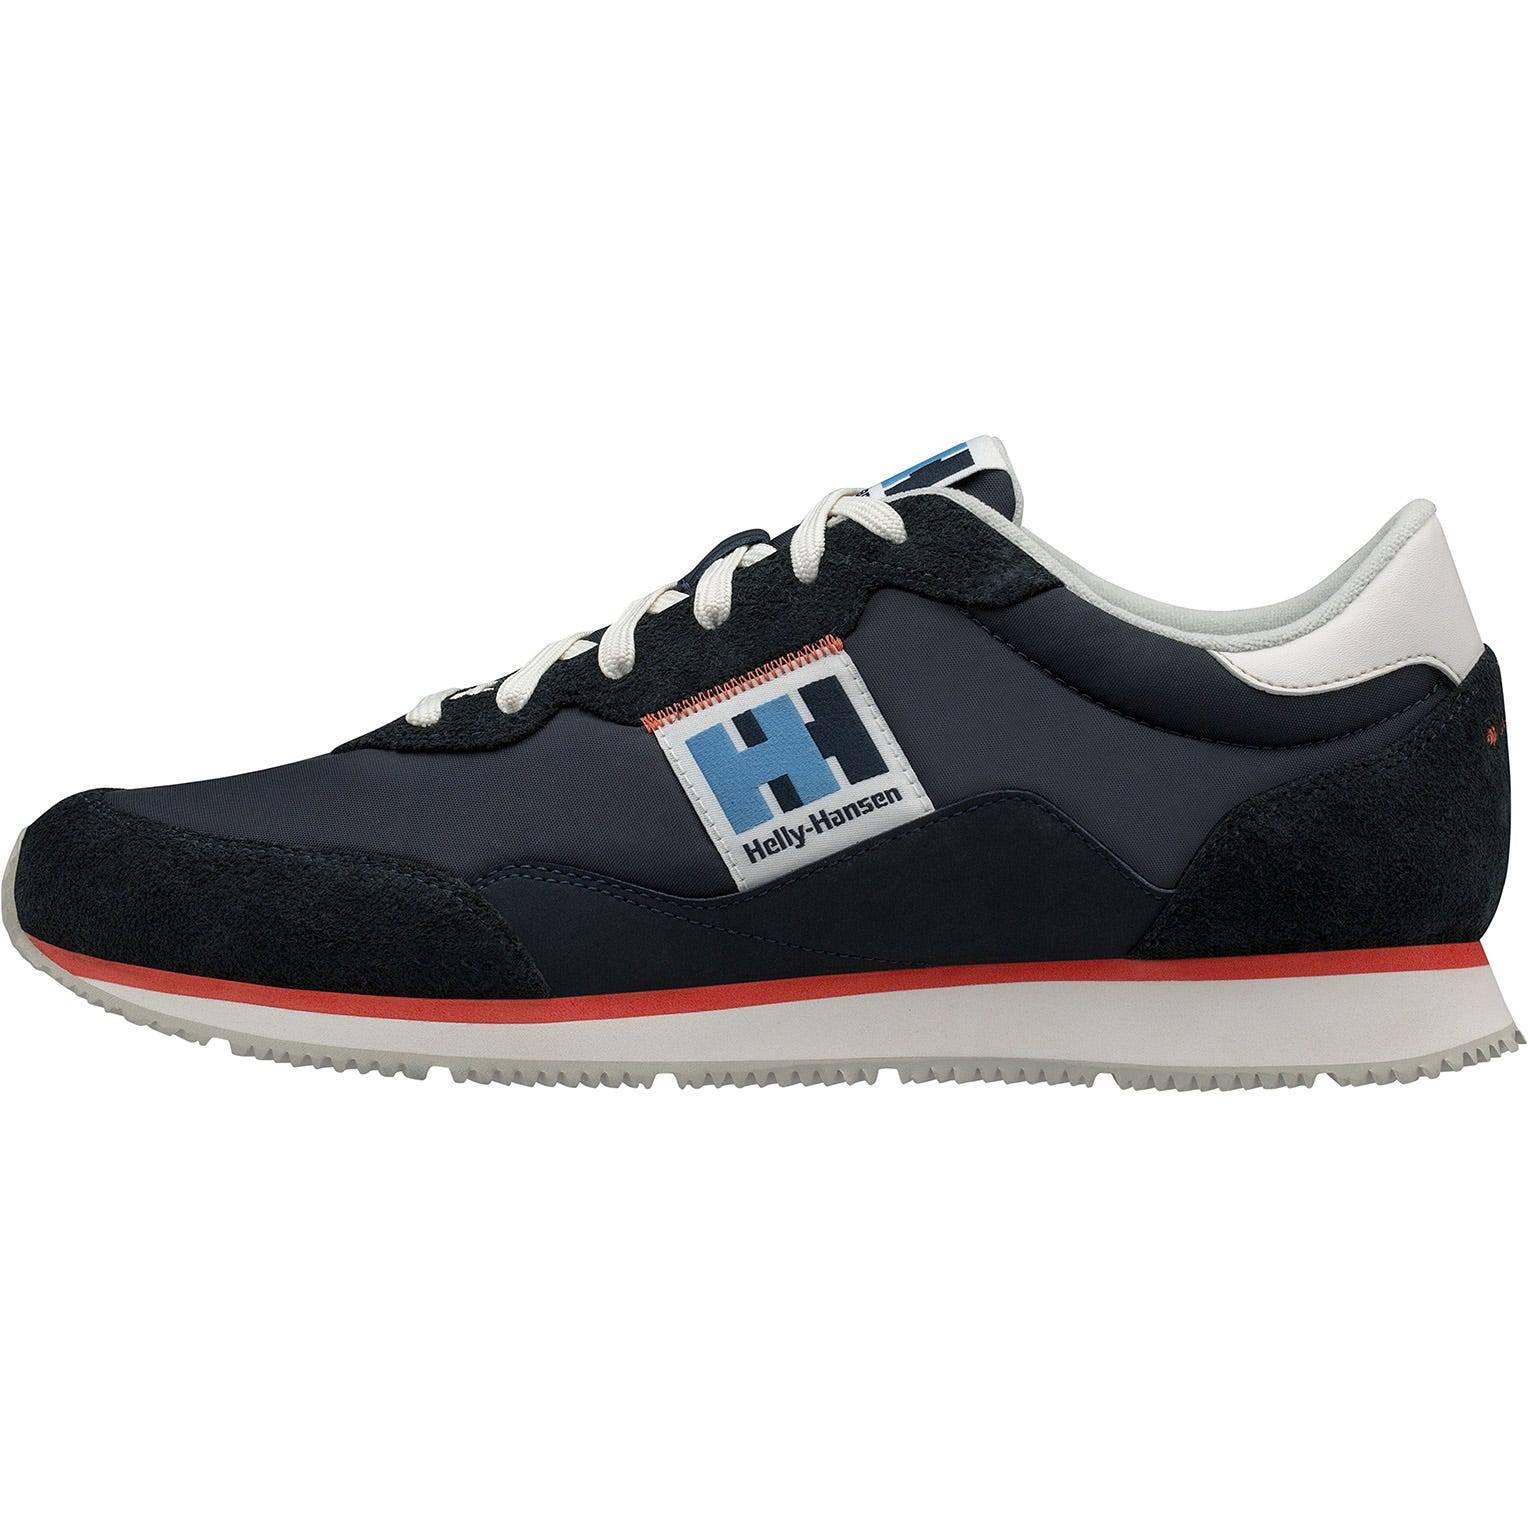 Helly Hansen Ripples Lowcut Sneaker Mens Casual Shoe Navy 43/9.5